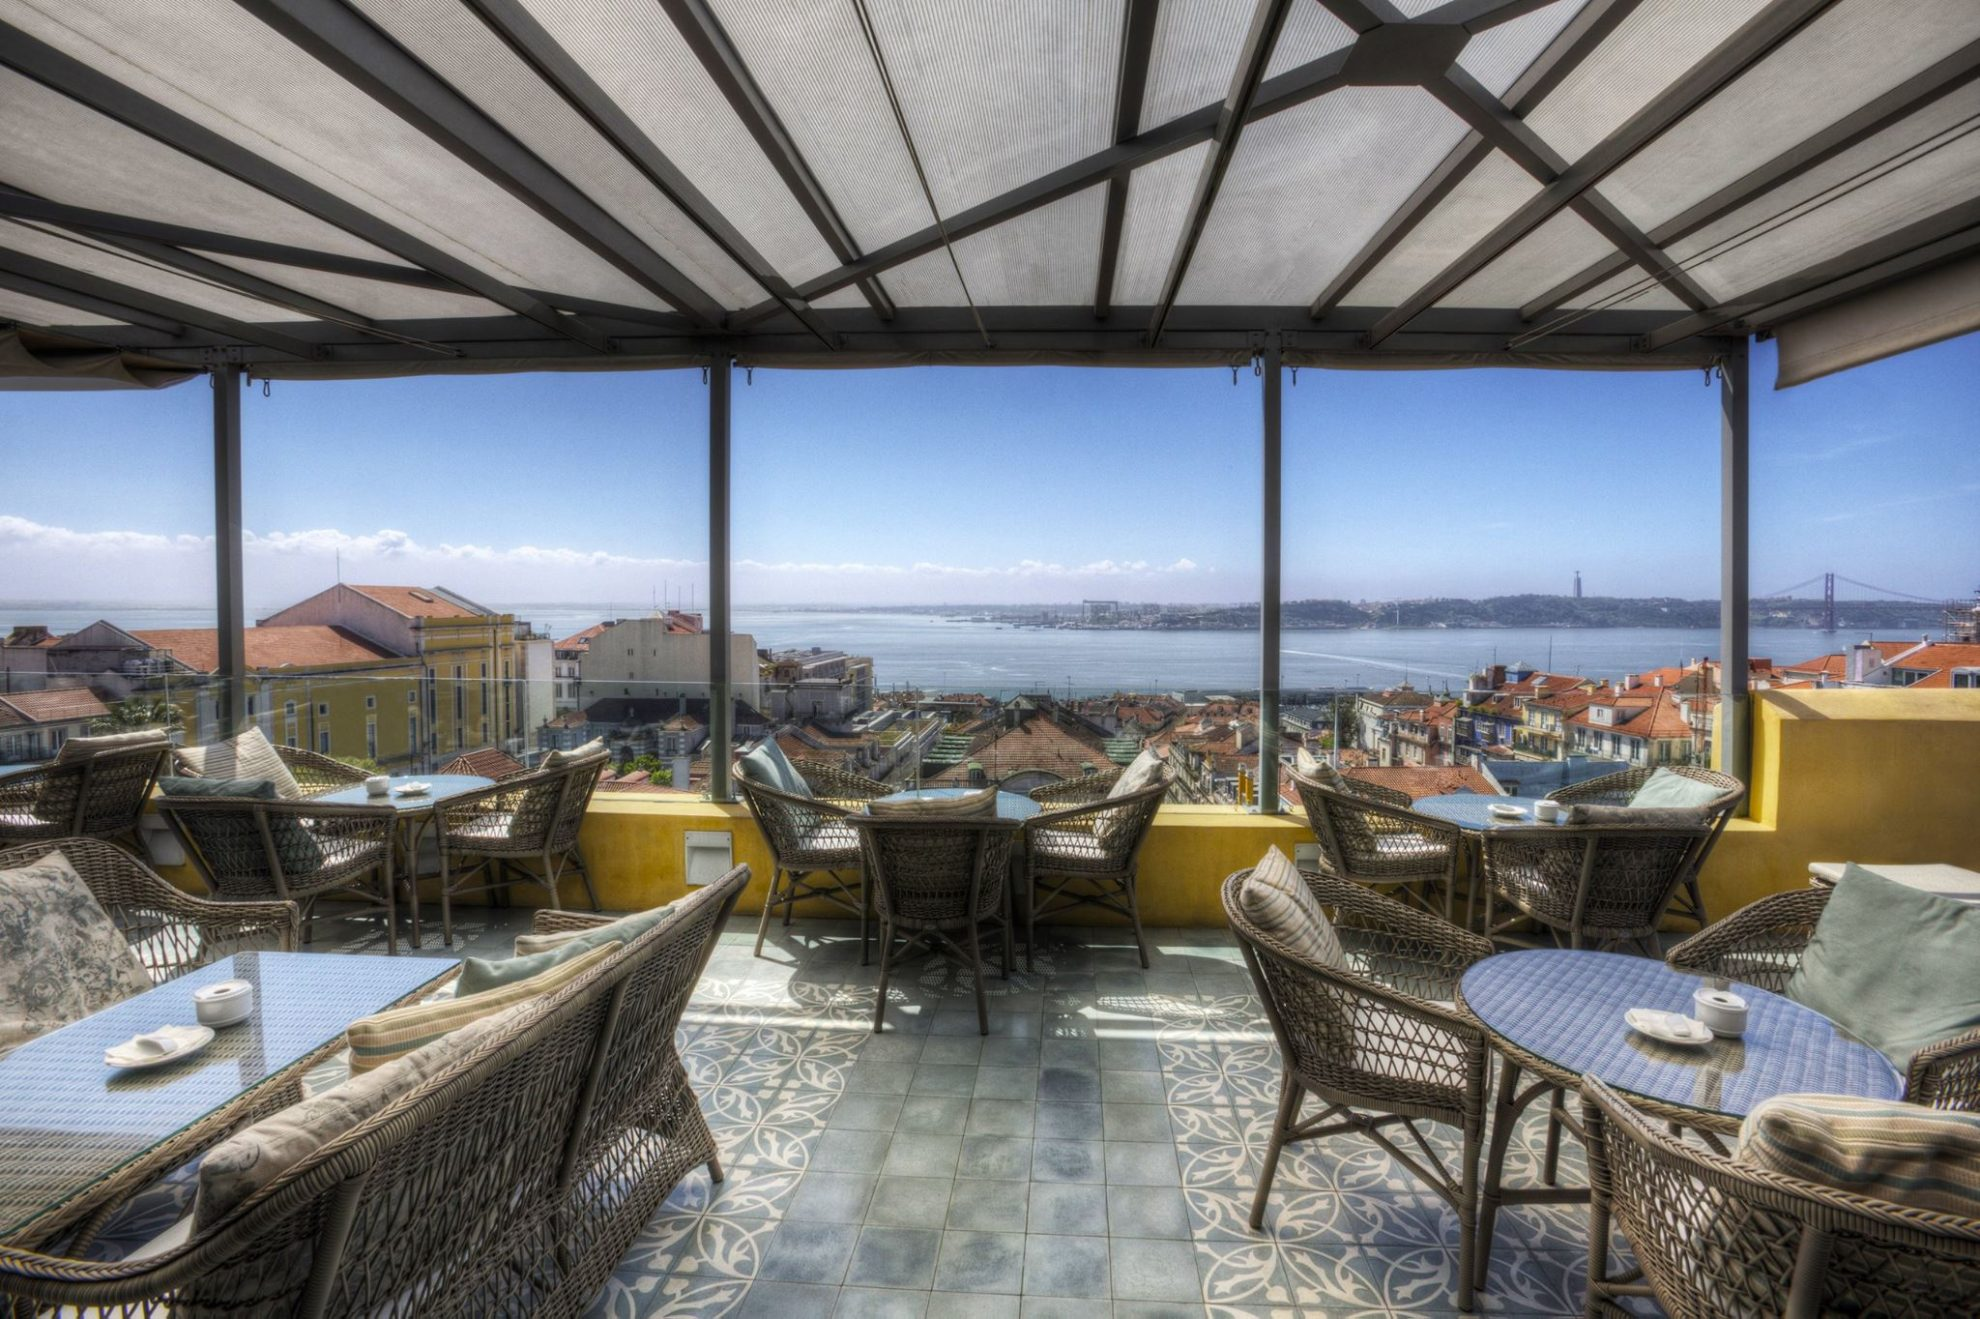 Terrace ba bar terrasse du bairro alto hotel lisbonne - Hotel chambre avec terrasse paris ...